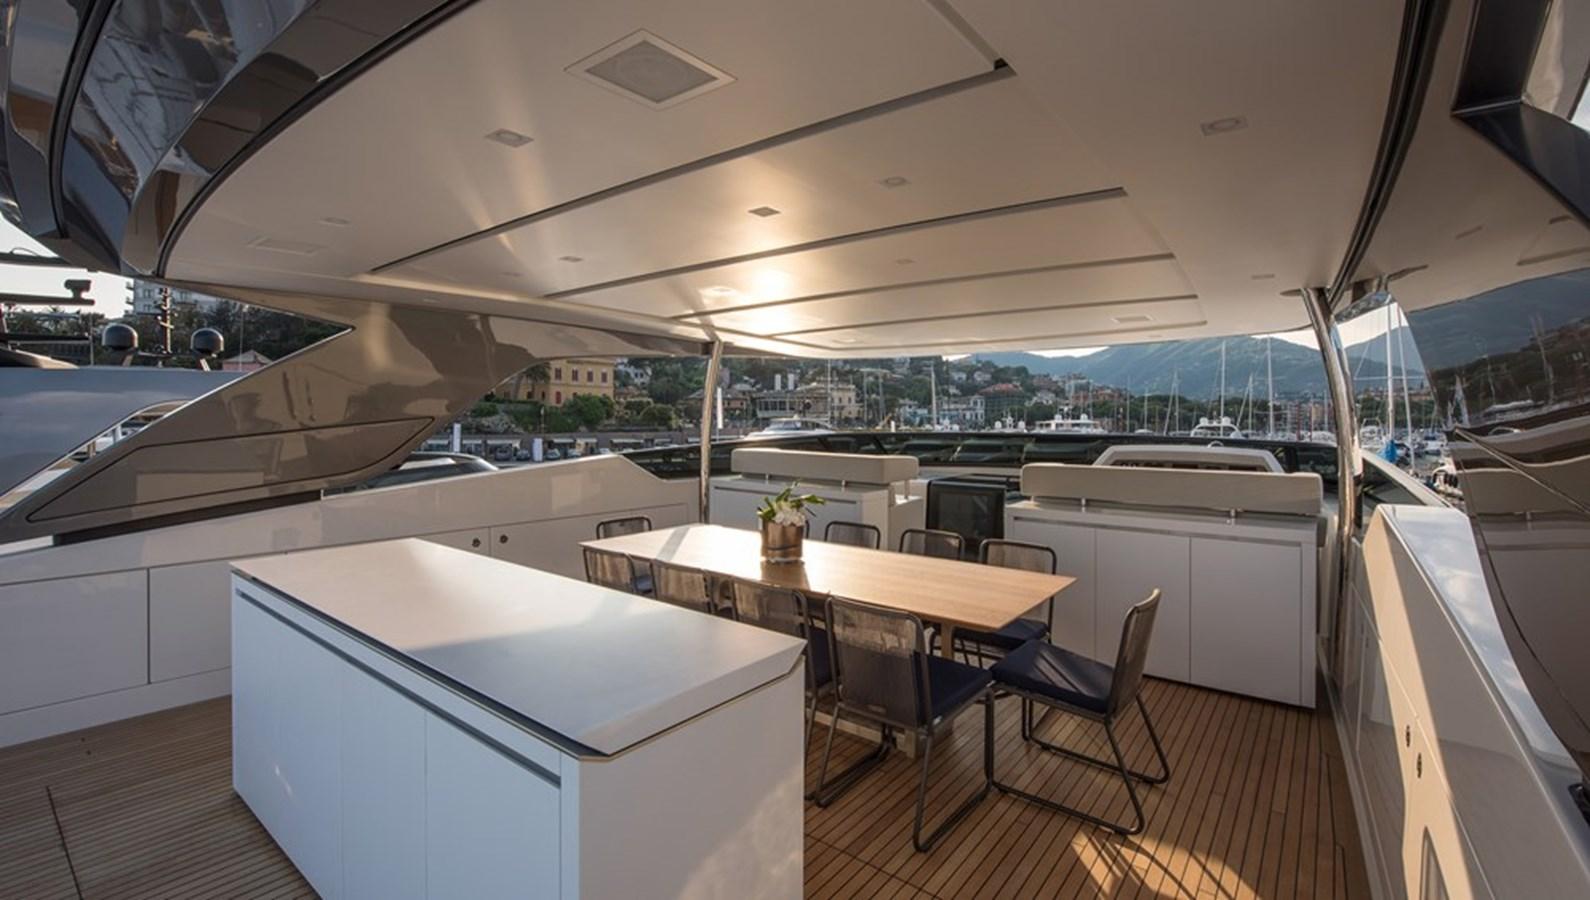 2016 Sanlorenzo SL106 #625 yacht for sale